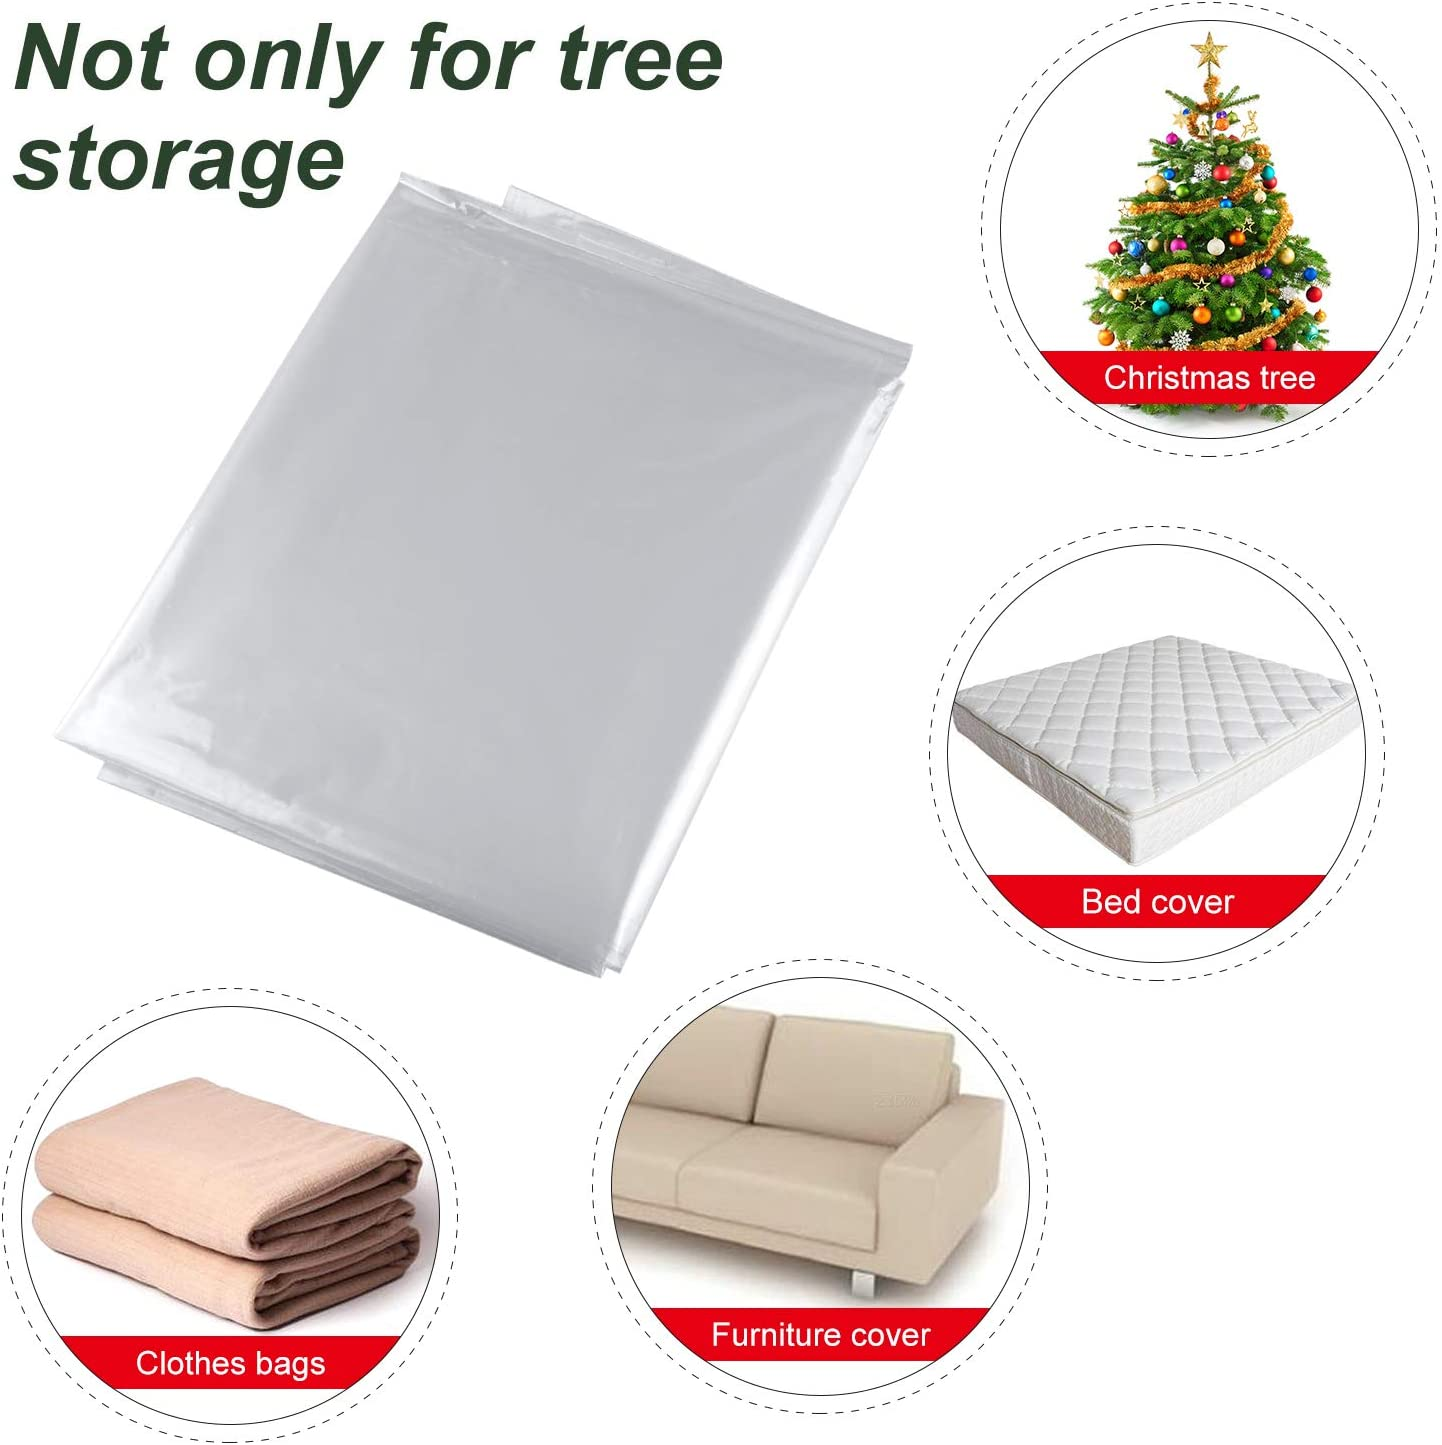 TUPARKA Christmas Tree Poly Storage Bag Large Size 110 x 31.5 for 7 ft Tree